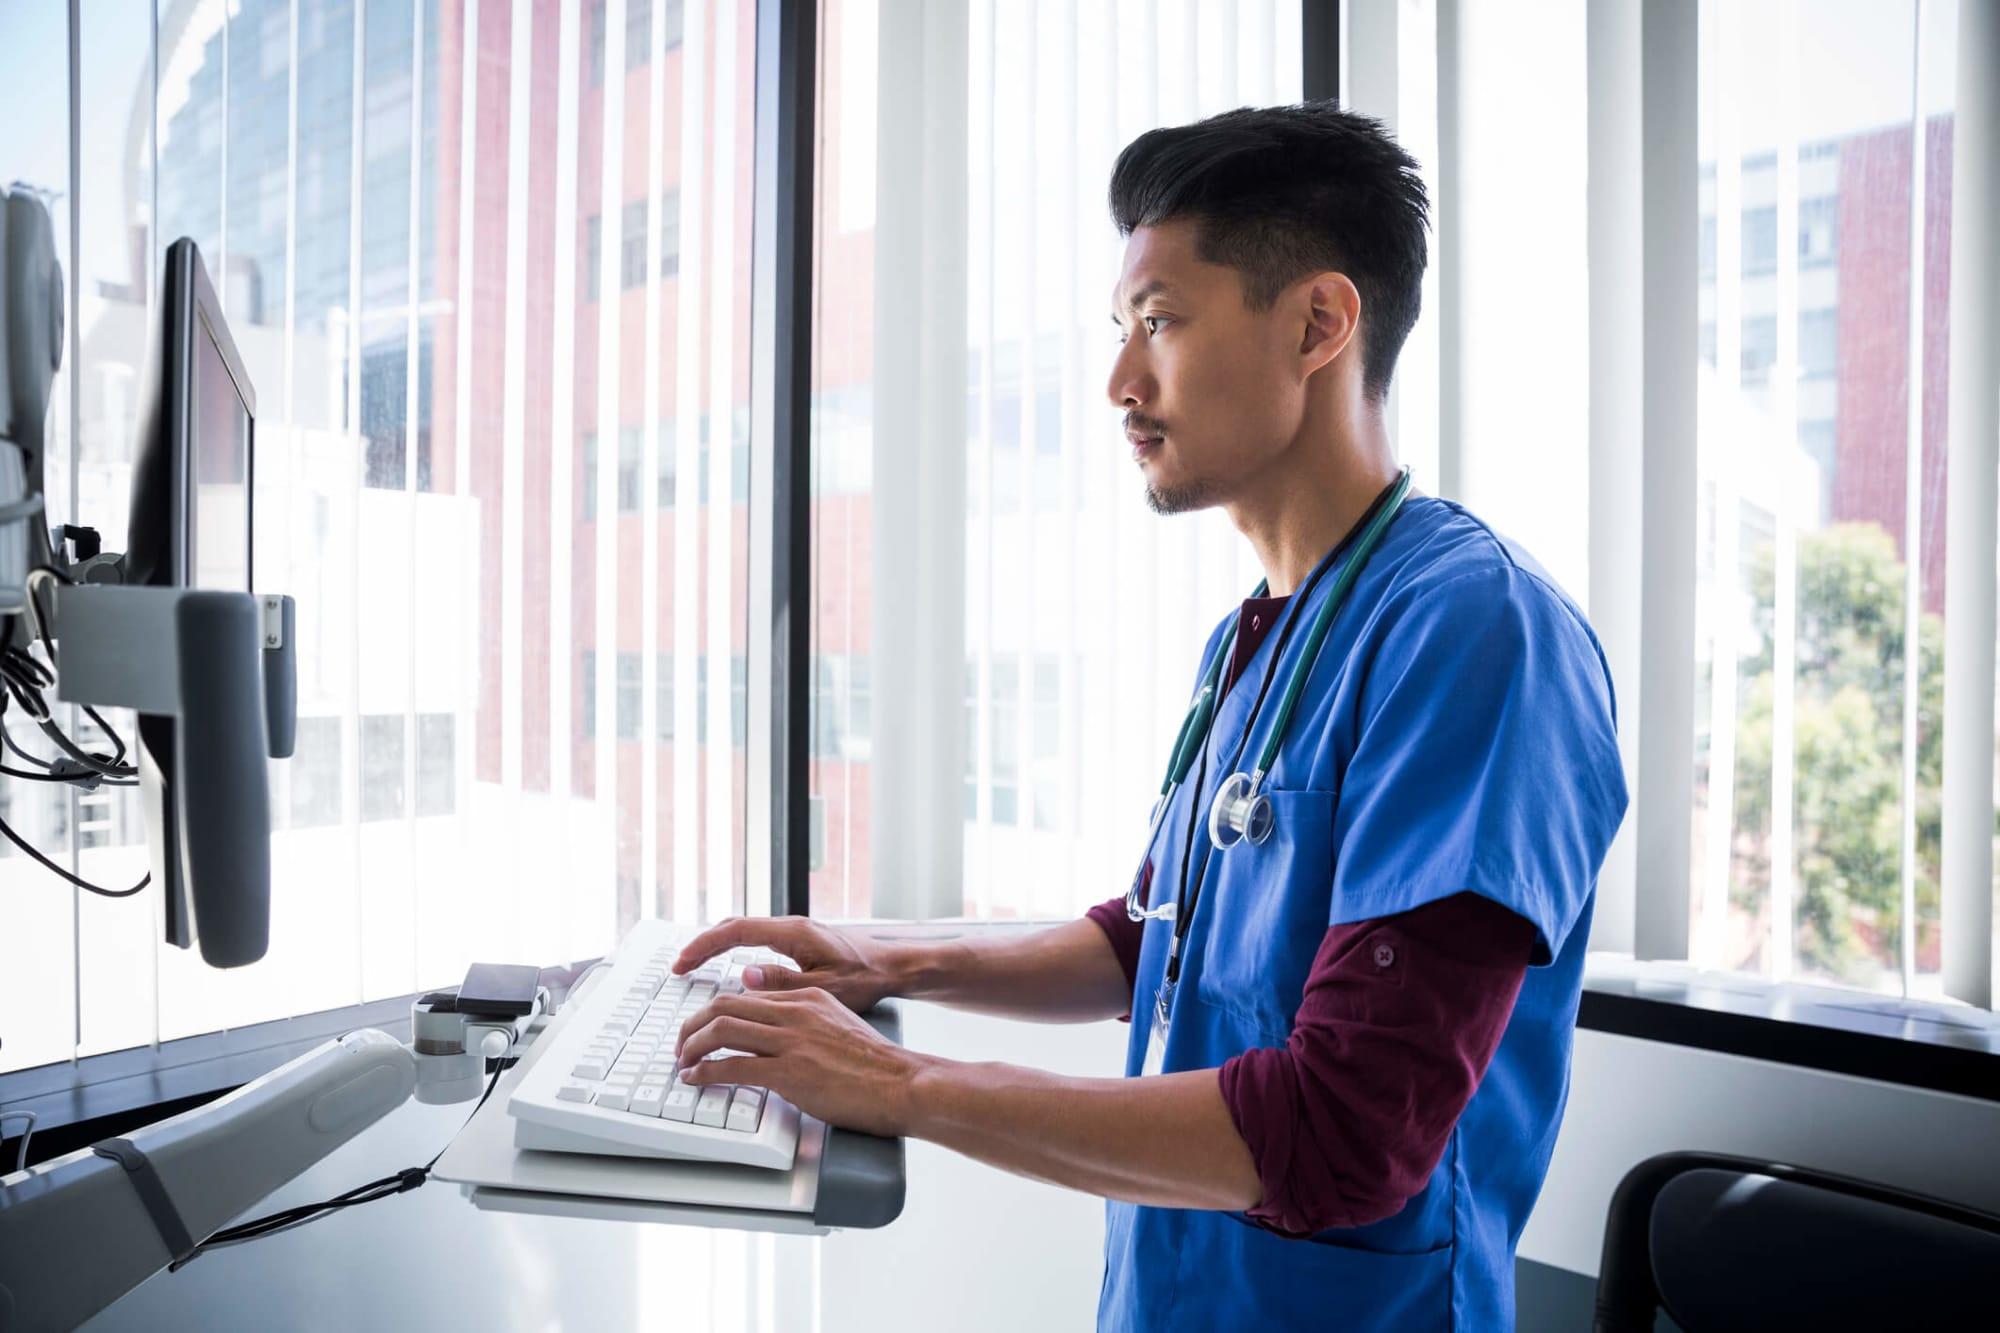 Medical Billing and Coding vs. Nursing